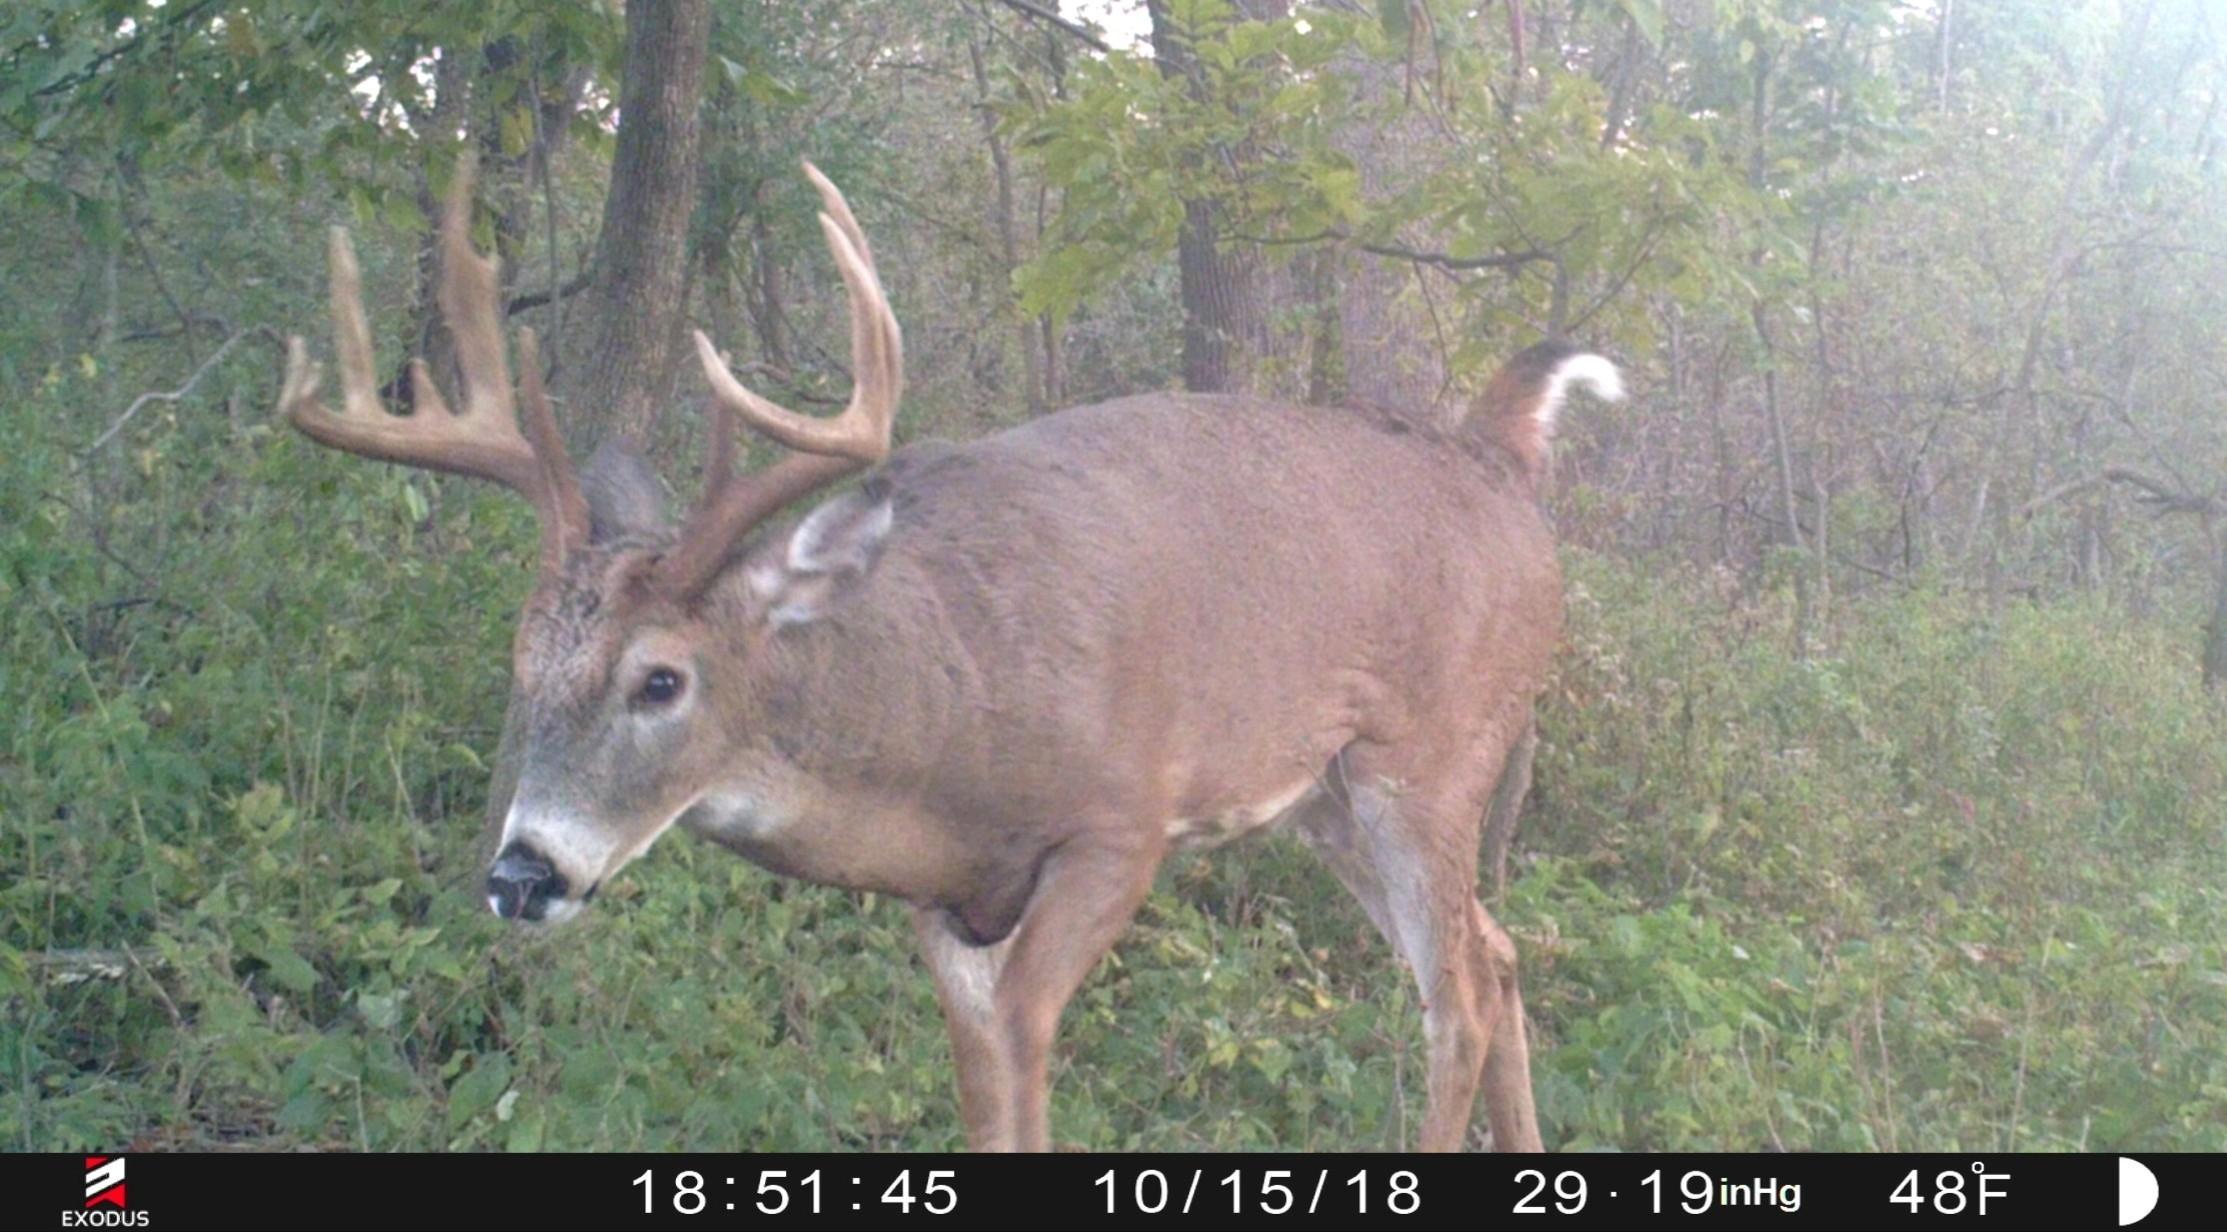 When Will The Whitetail Rut Begin | Whitetail Habitat Solutions  Nj Deer Rut Forcast 2021